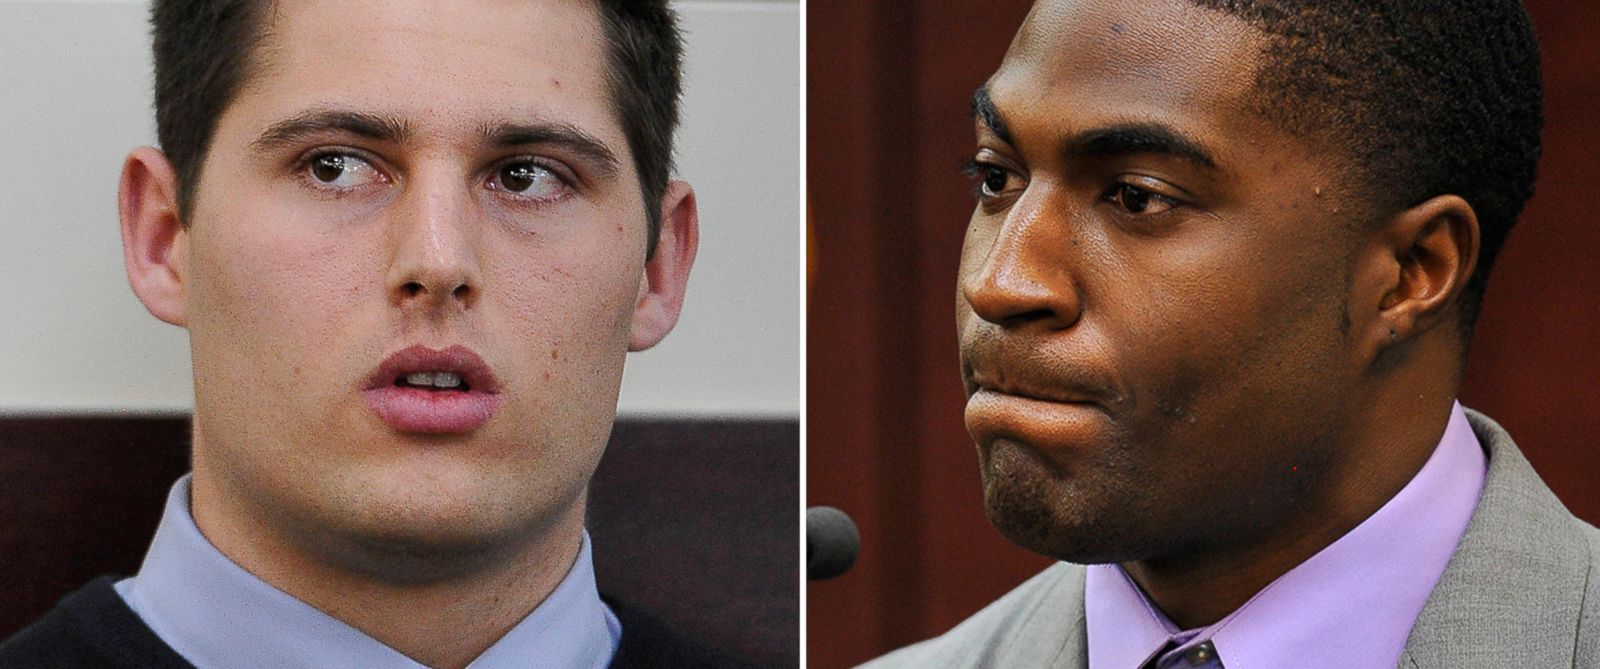 PHOTO: Brandon Vandenburg is seen in court on Jan. 27, 2015 and Cory Batey testifies on Jan. 26, 2015.